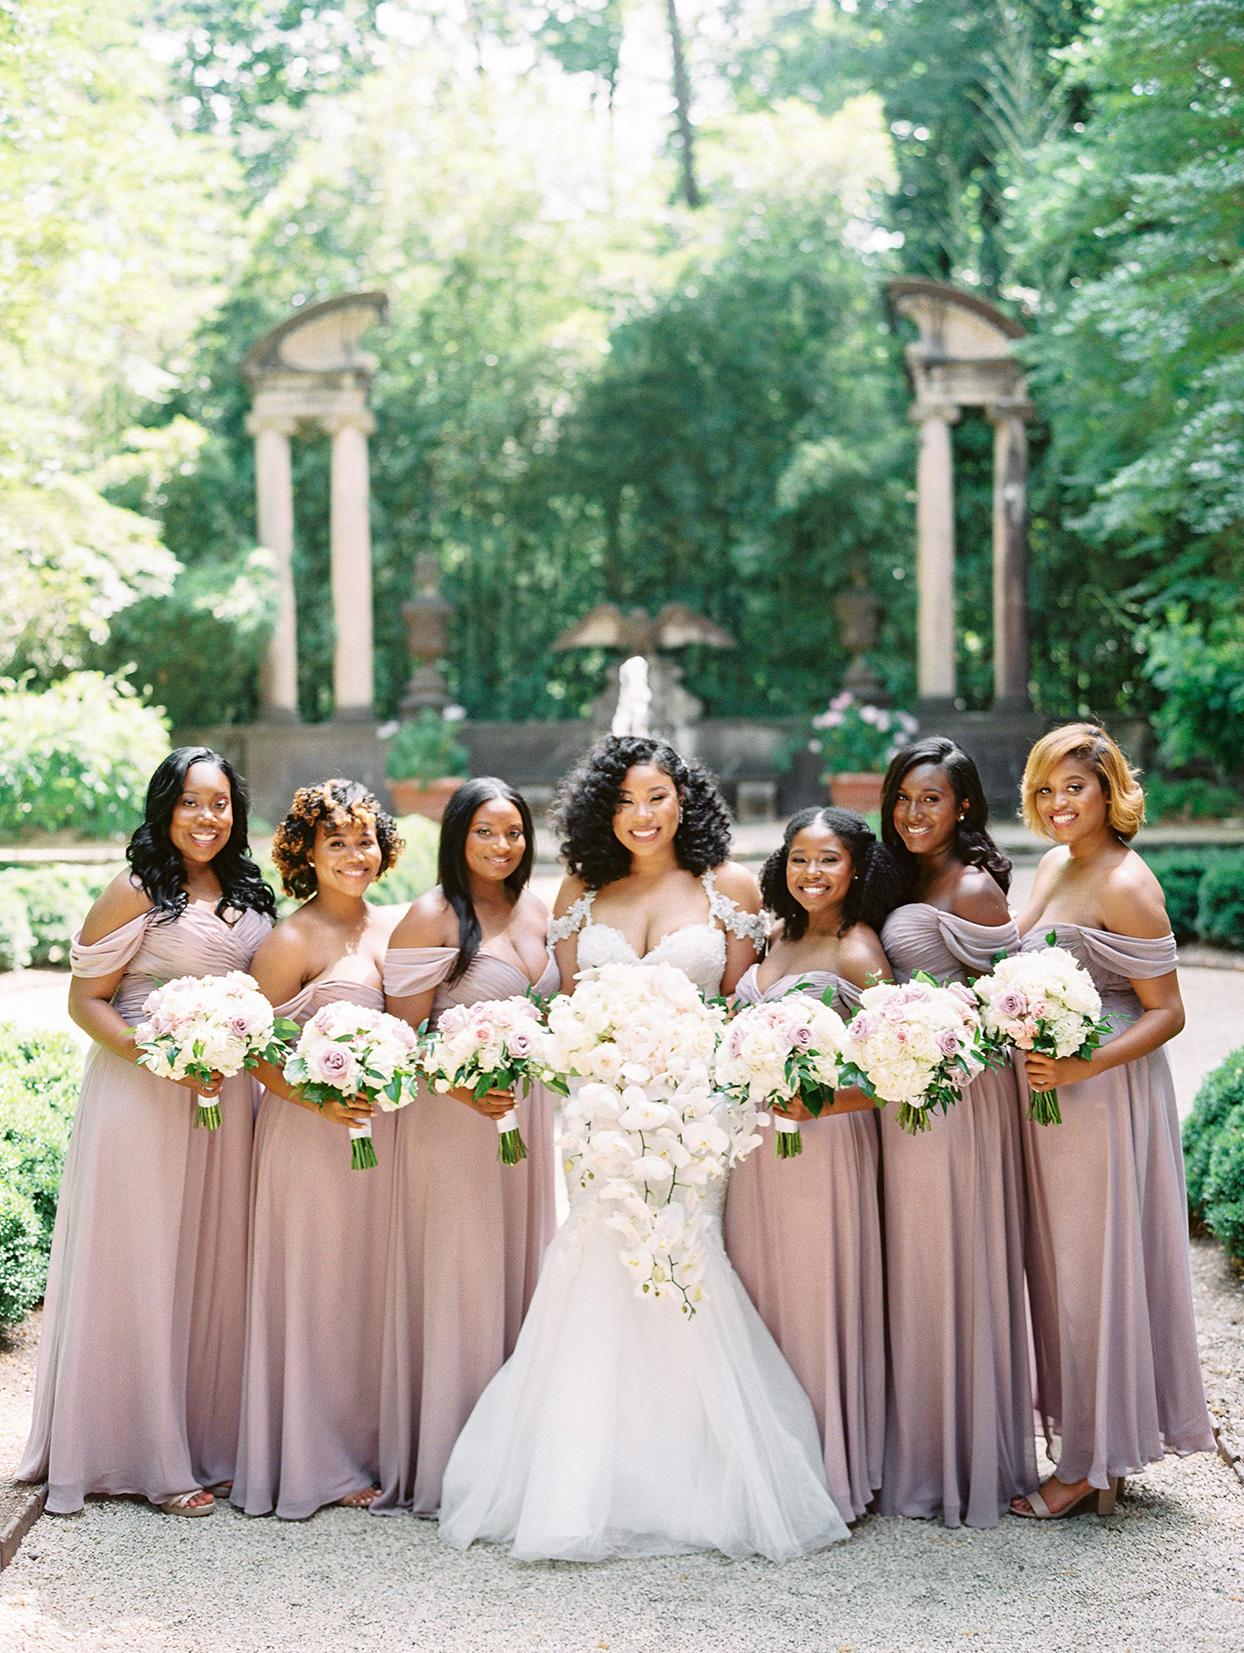 amelia justin wedding bridesmaids in mauve